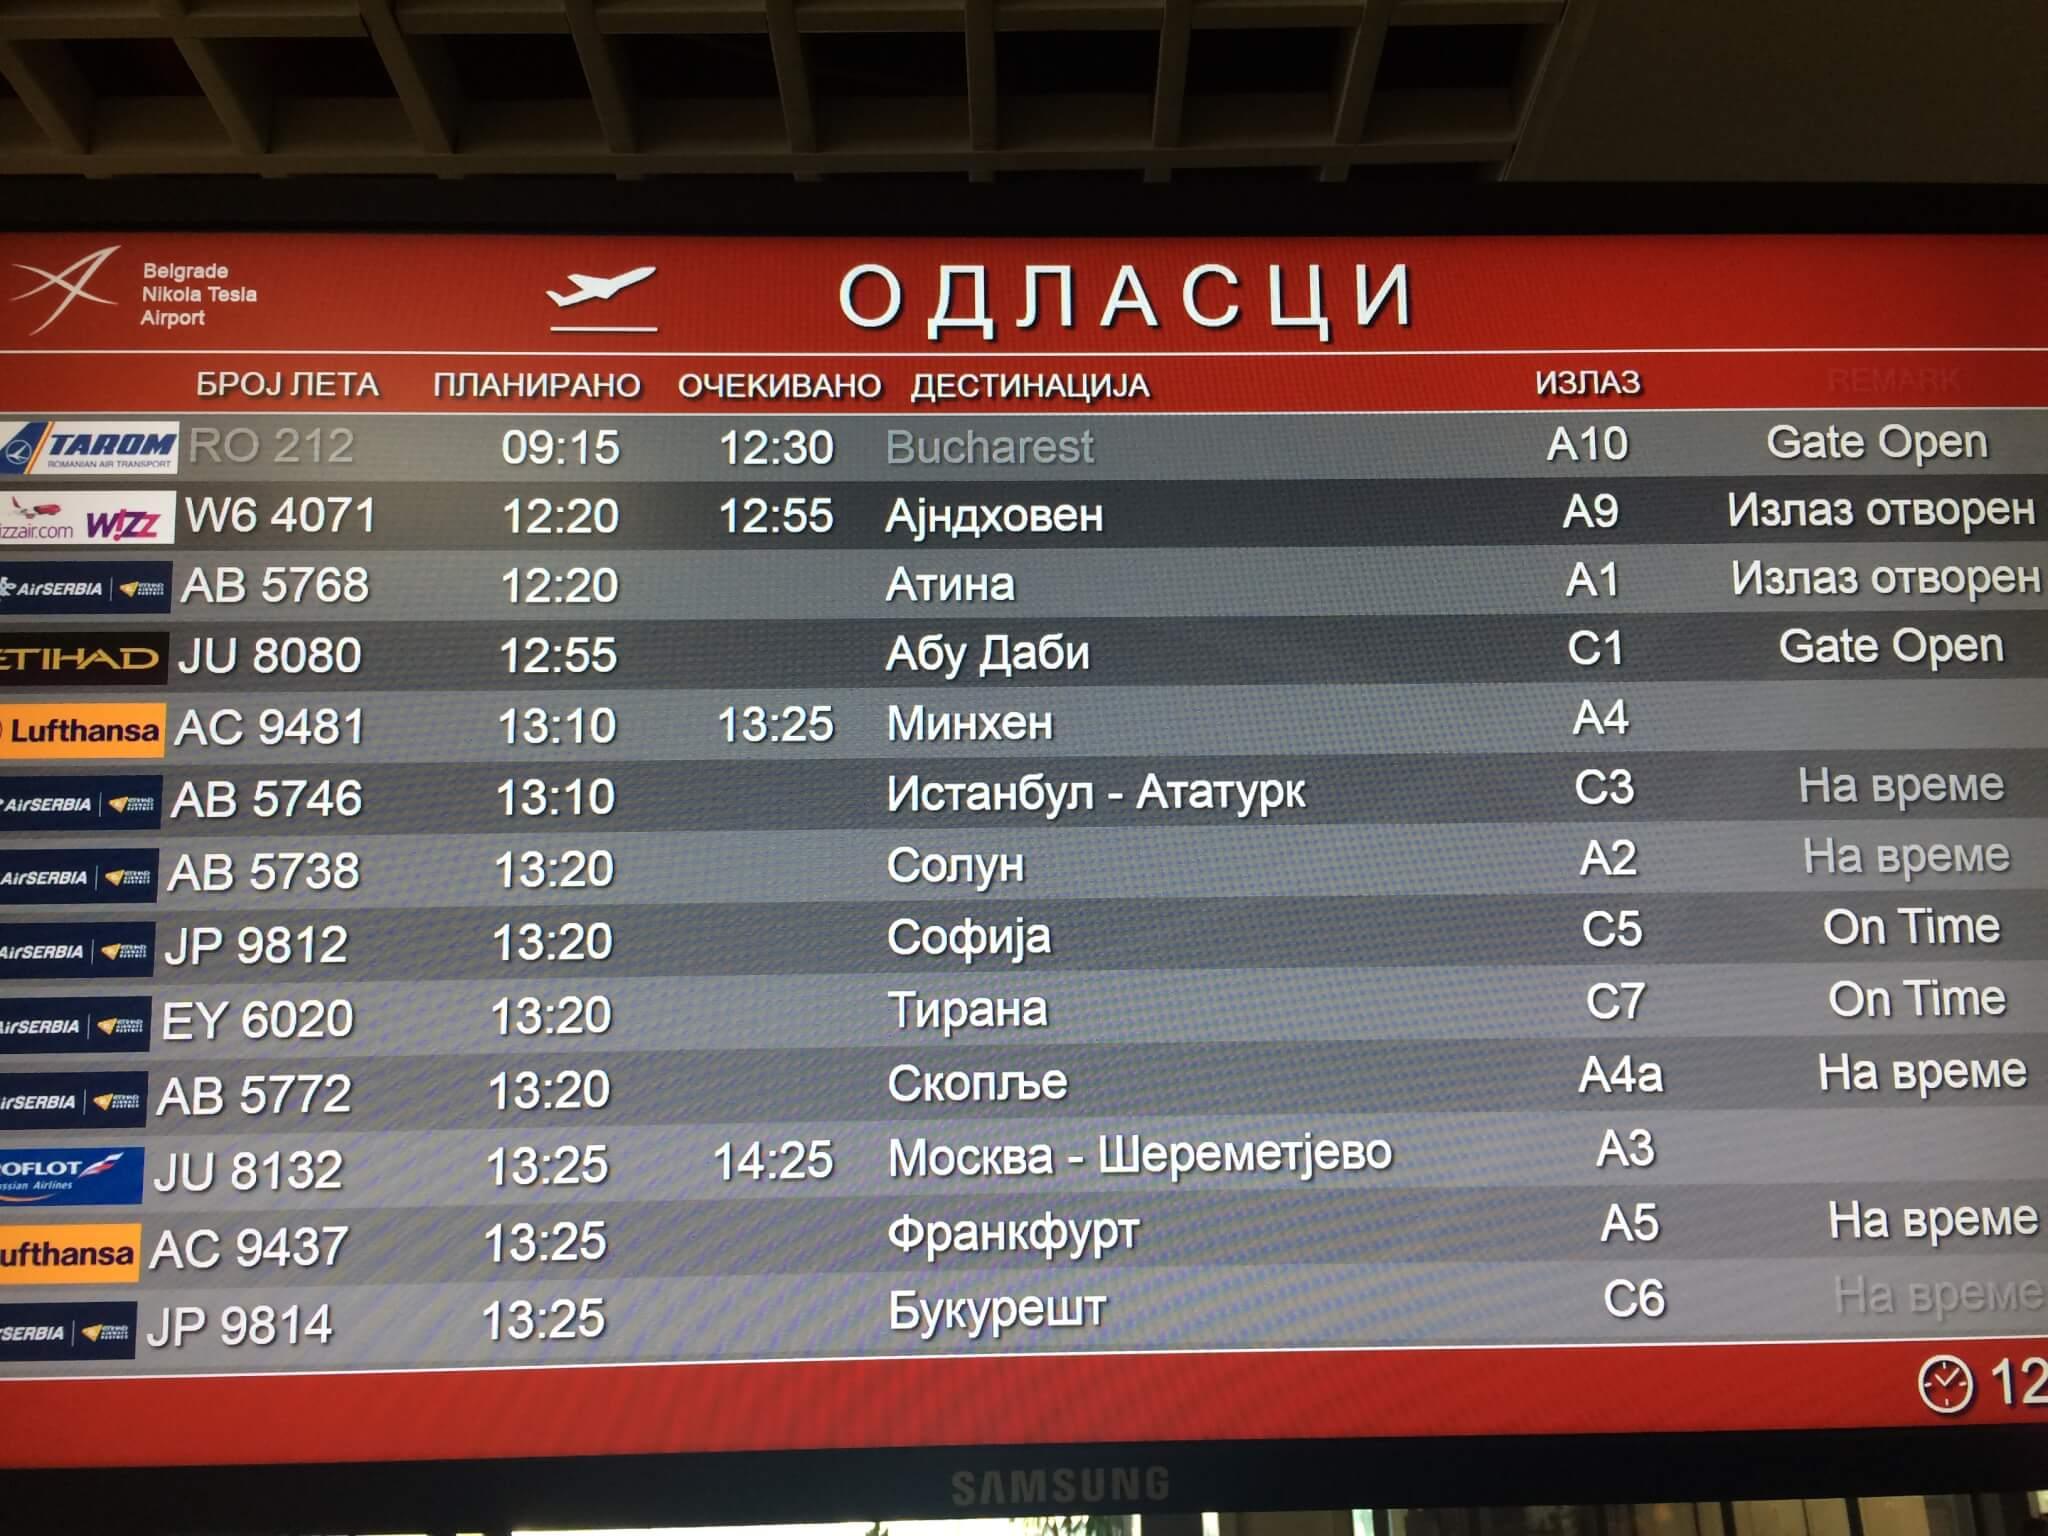 Flights from Beograd airport